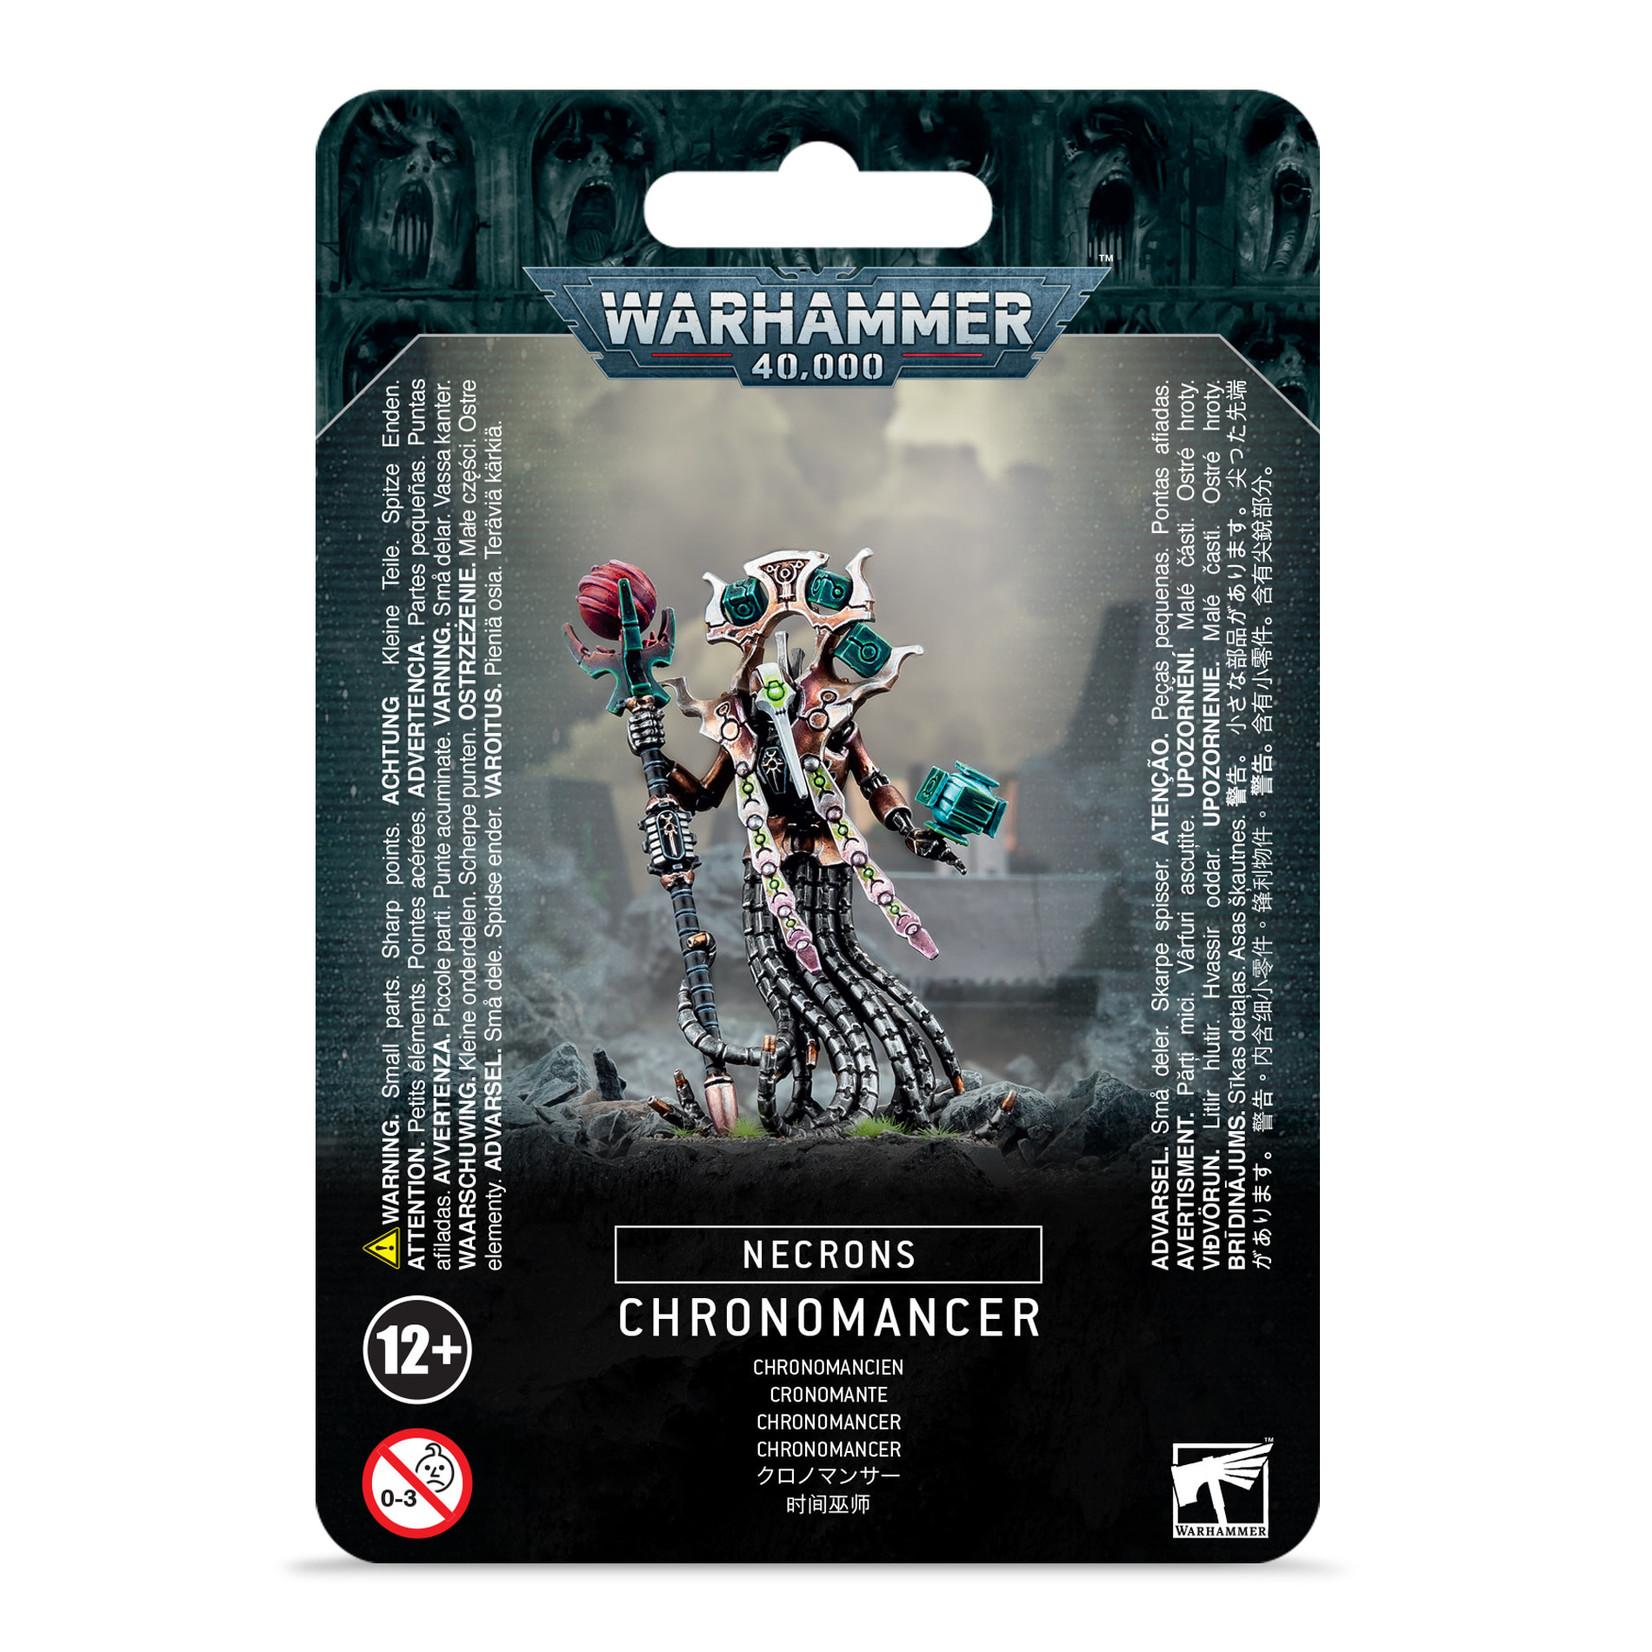 Warhammer 40K Necrons Chronomancer